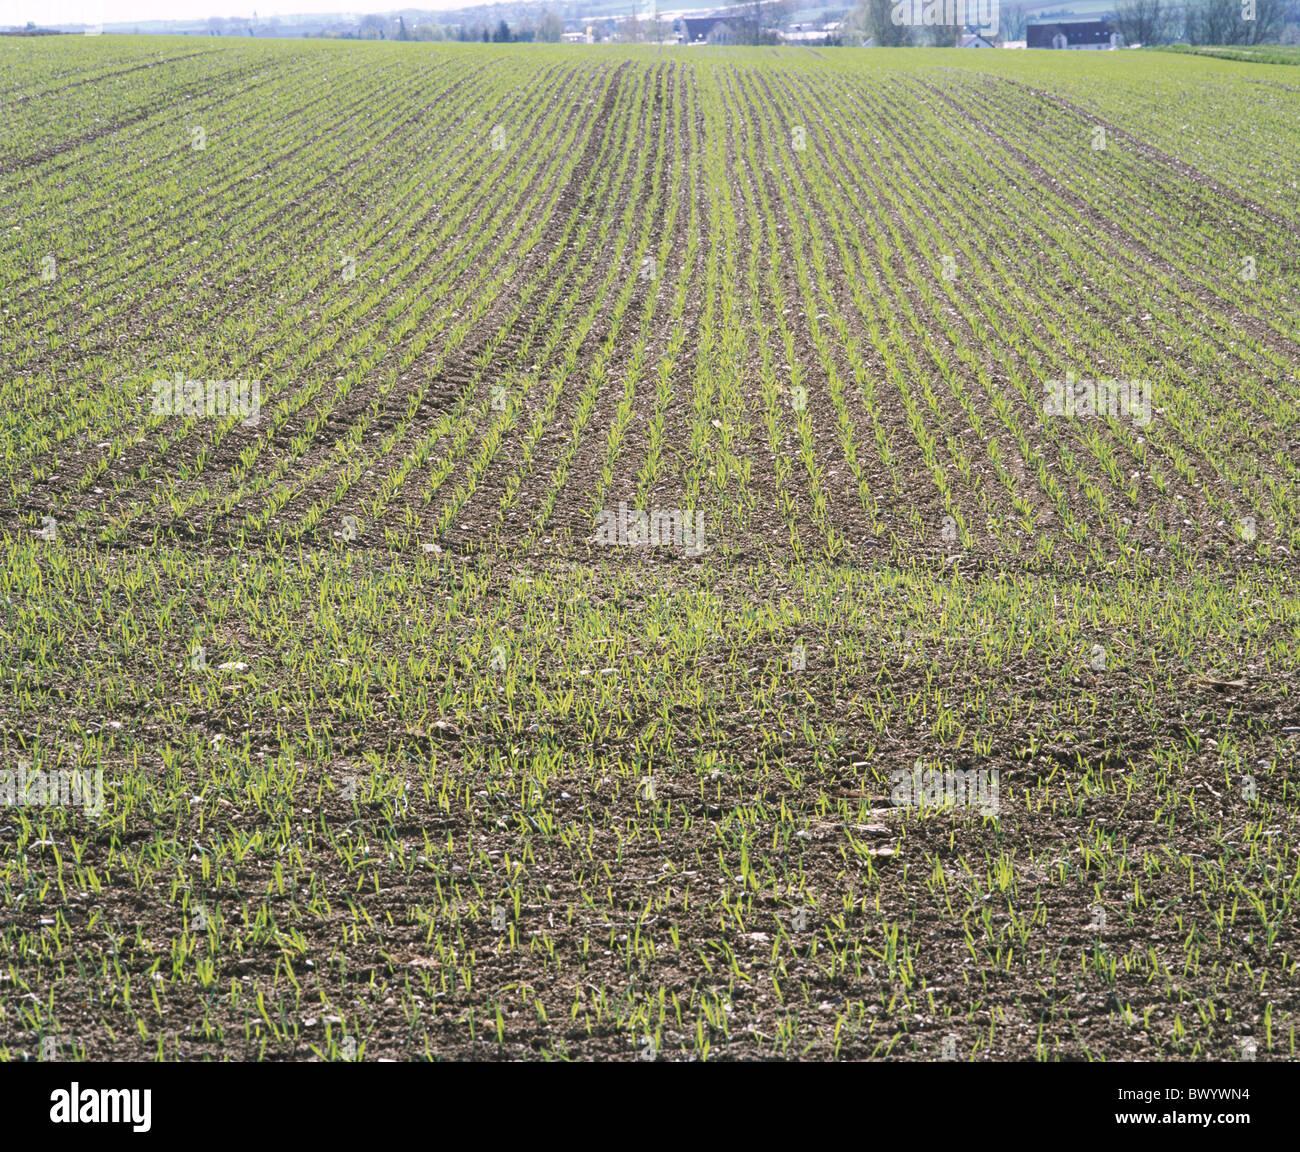 field cultivation field Keimlinge agriculture useful plants seedlings desires impulses grow Stock Photo